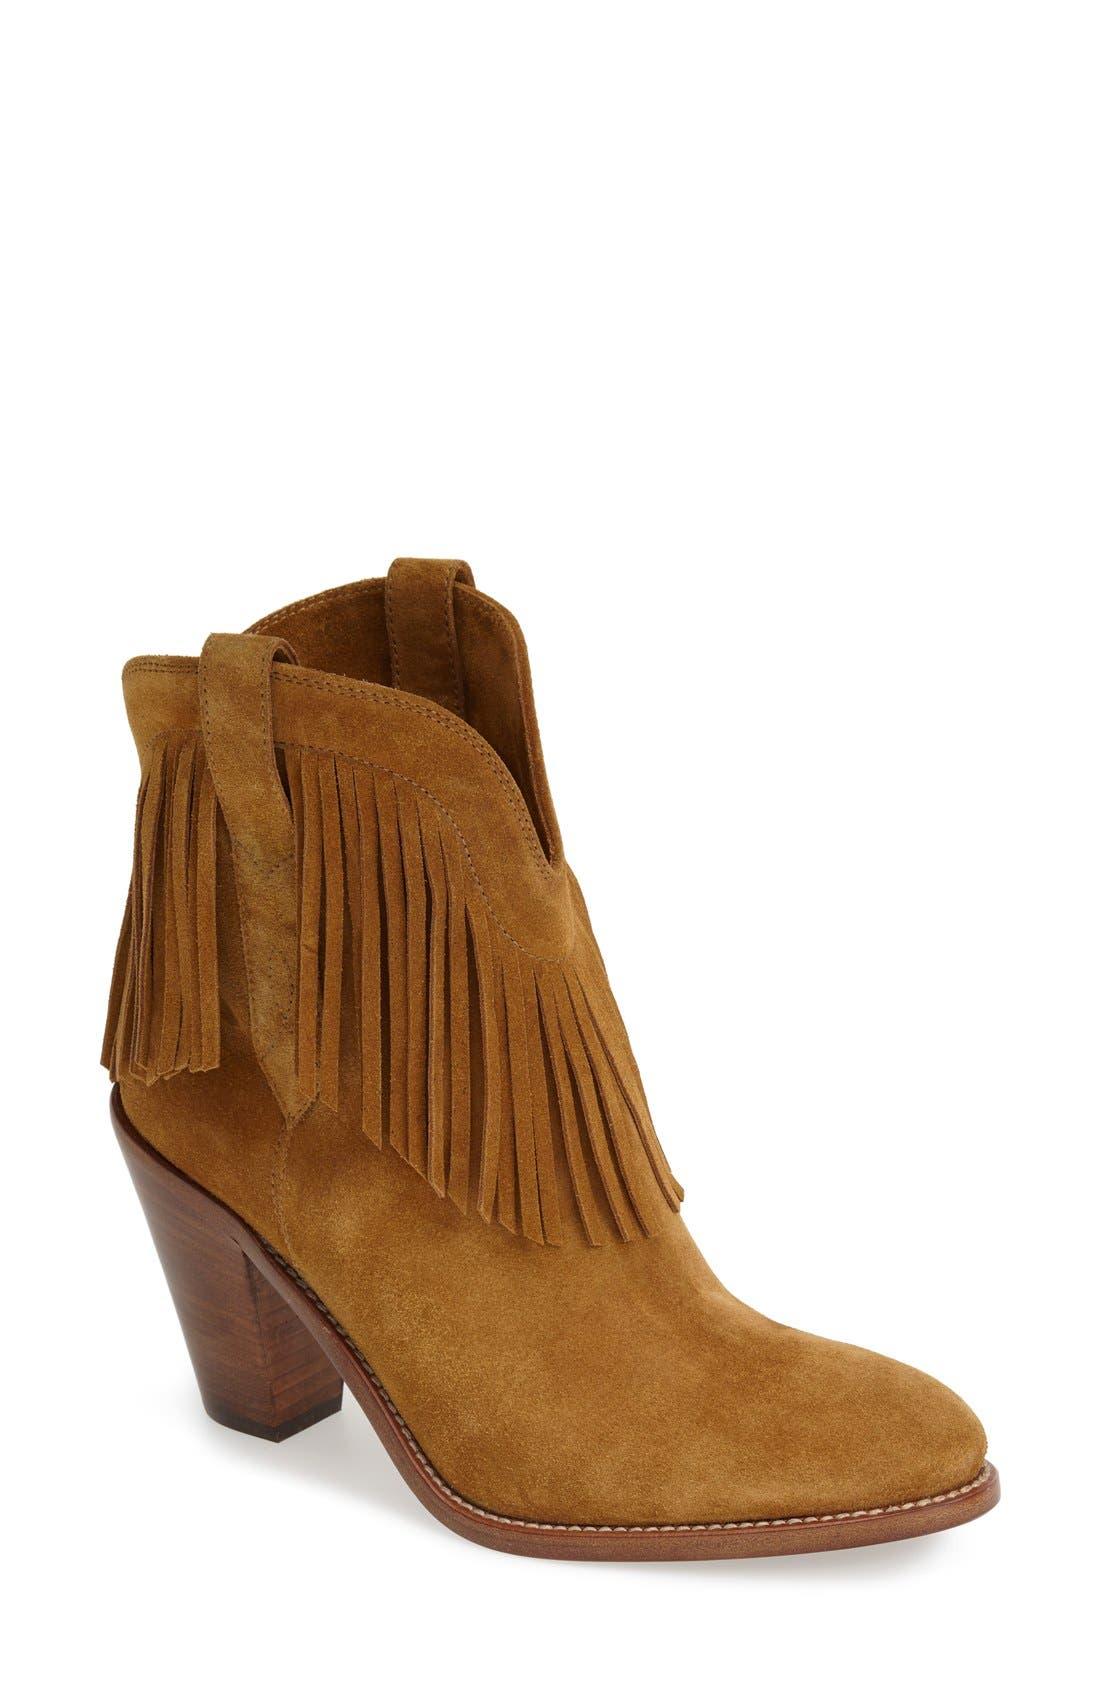 Main Image - Saint Laurent 'New Western' Fringe Boot (Women)